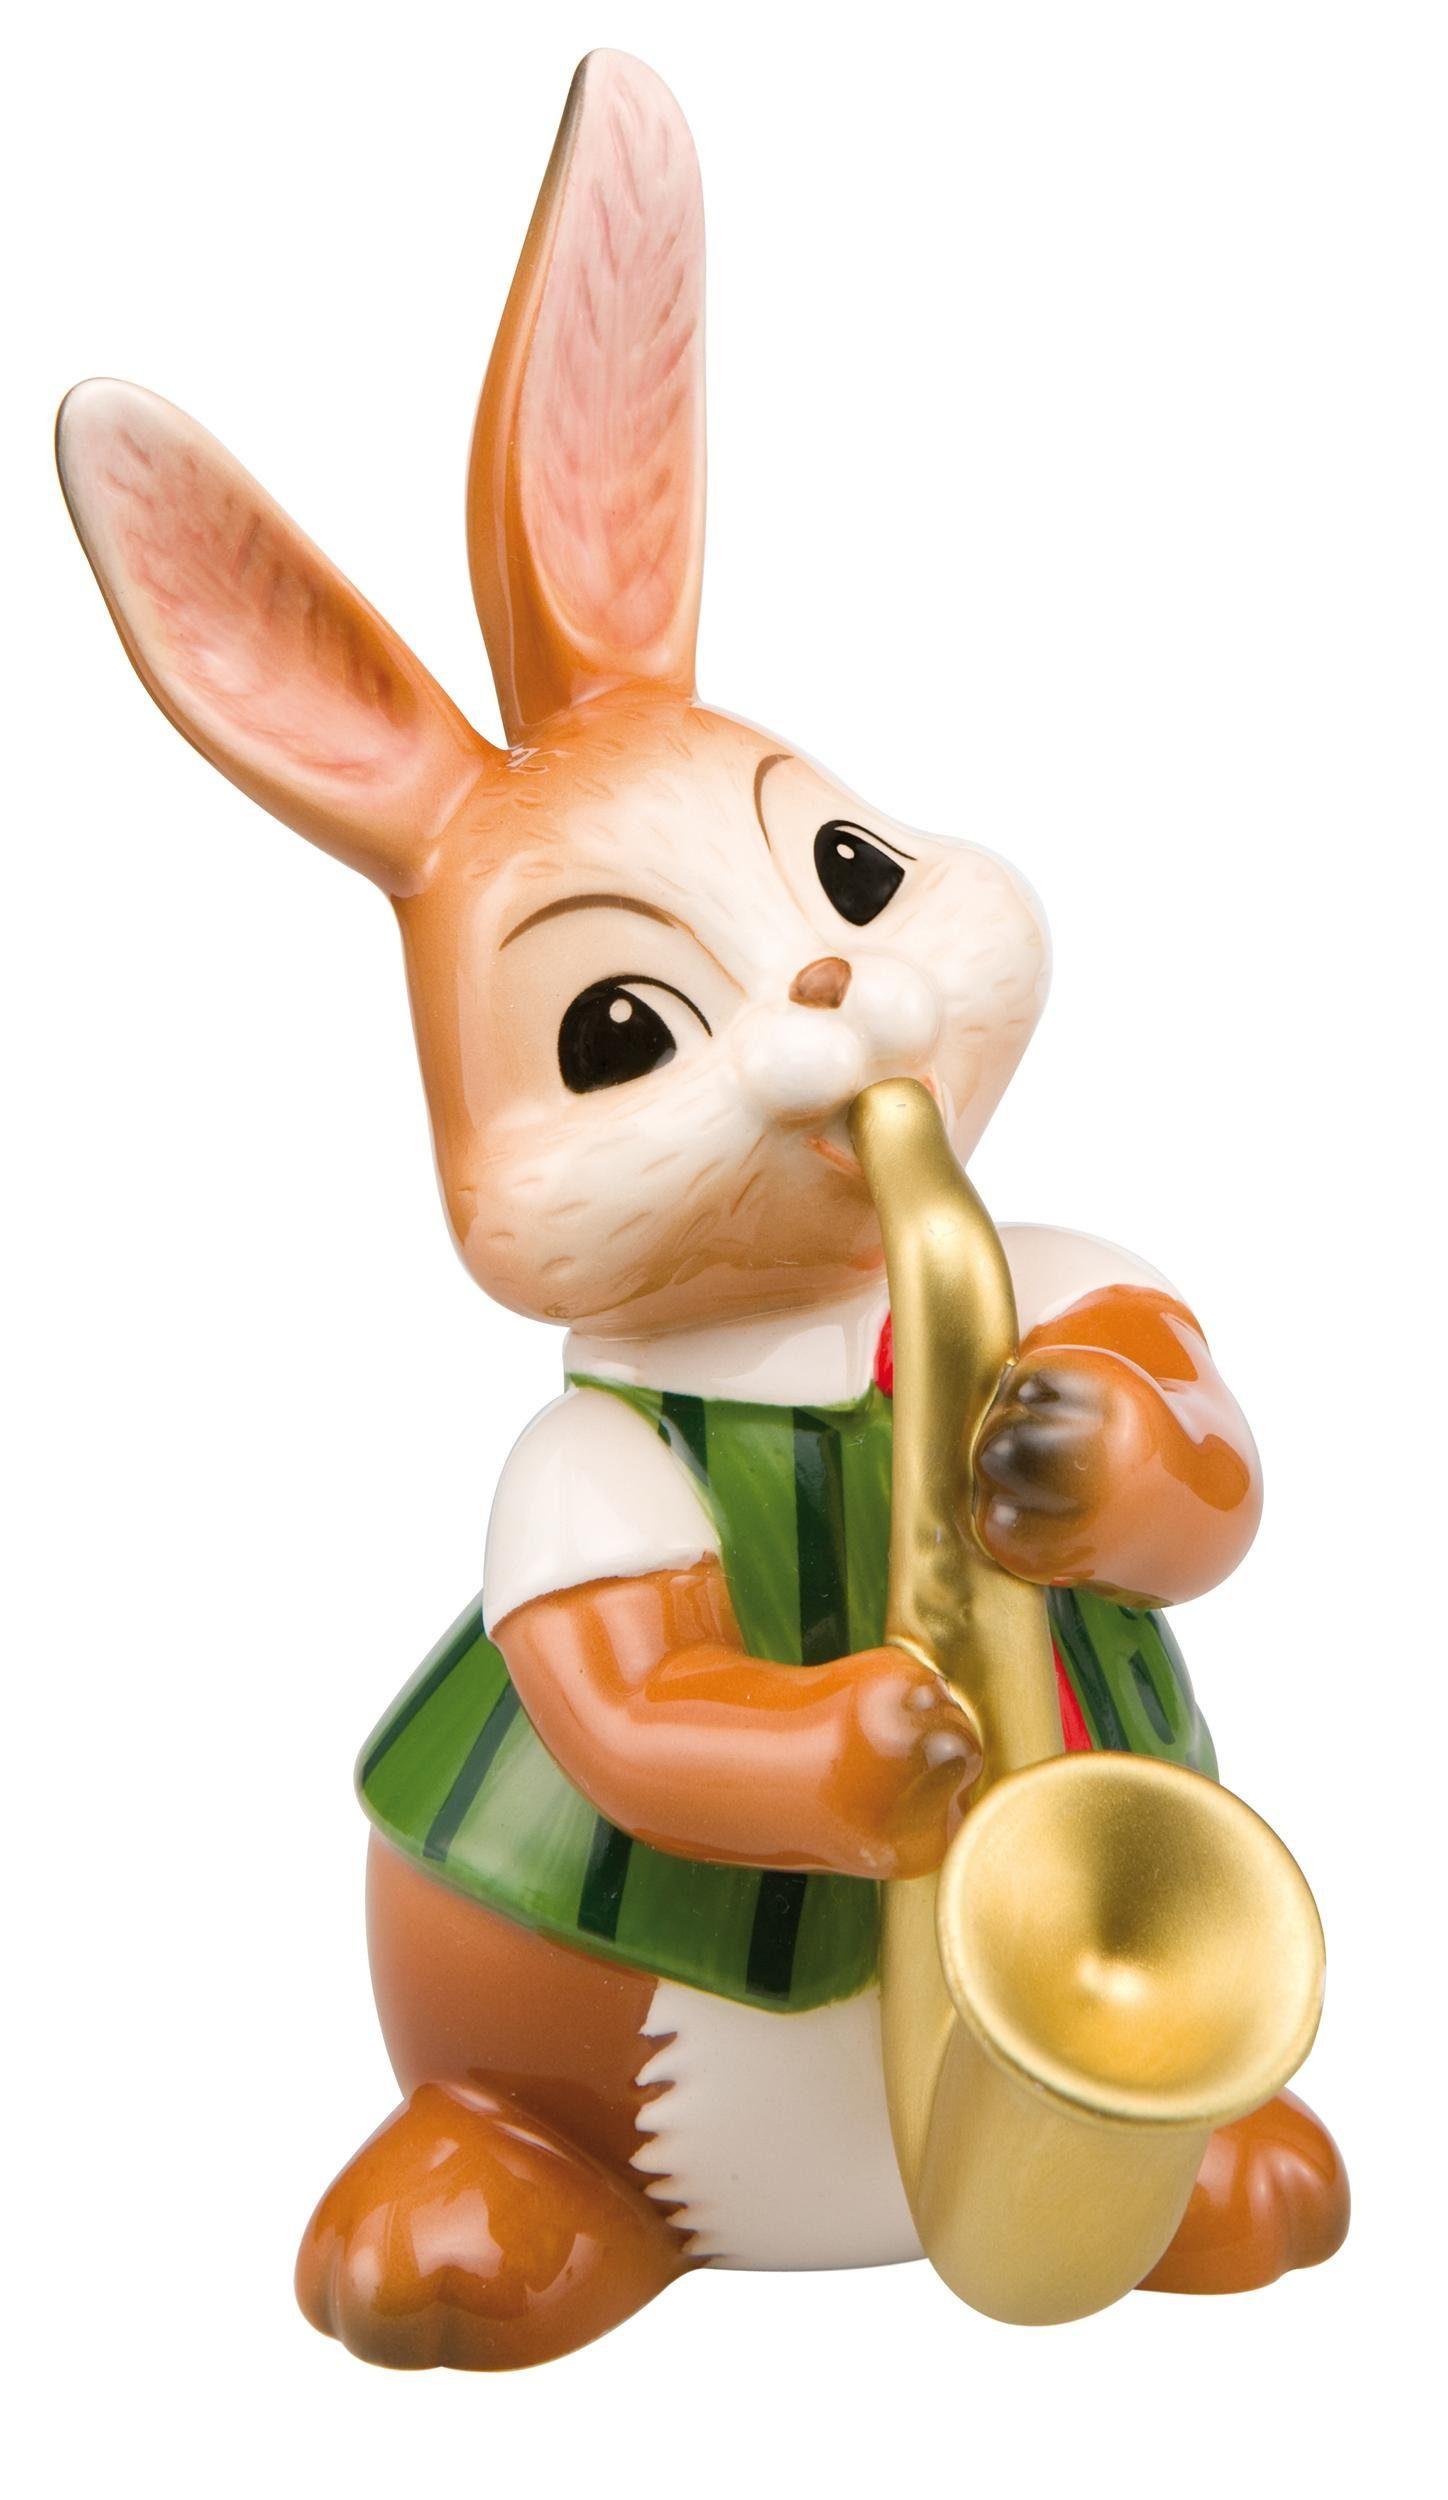 Goebel Sammelfigur »Saxophonspieler« (1 Stück), Osterhase